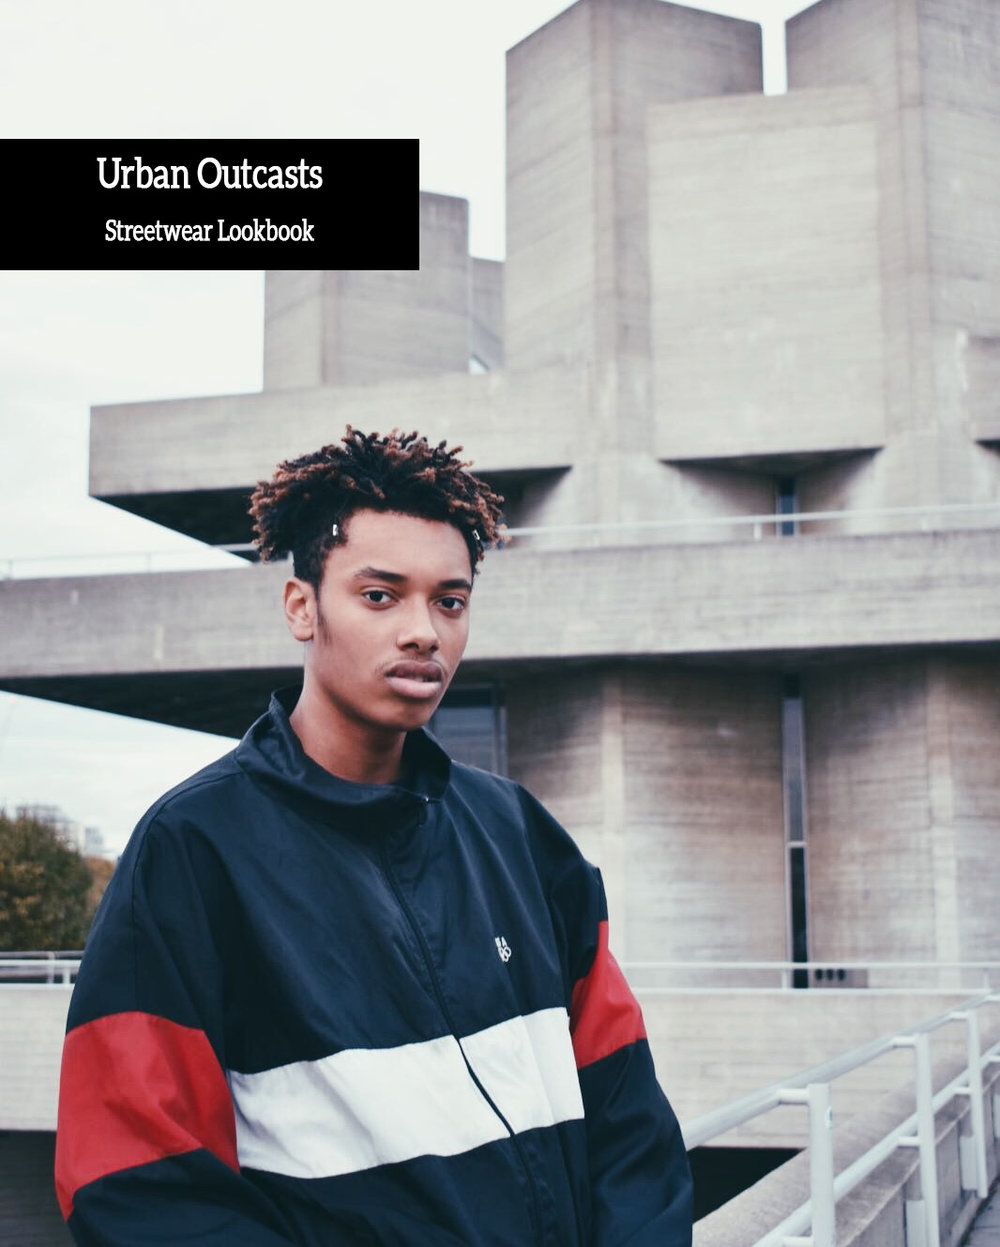 Urban_Outcasts.jpg